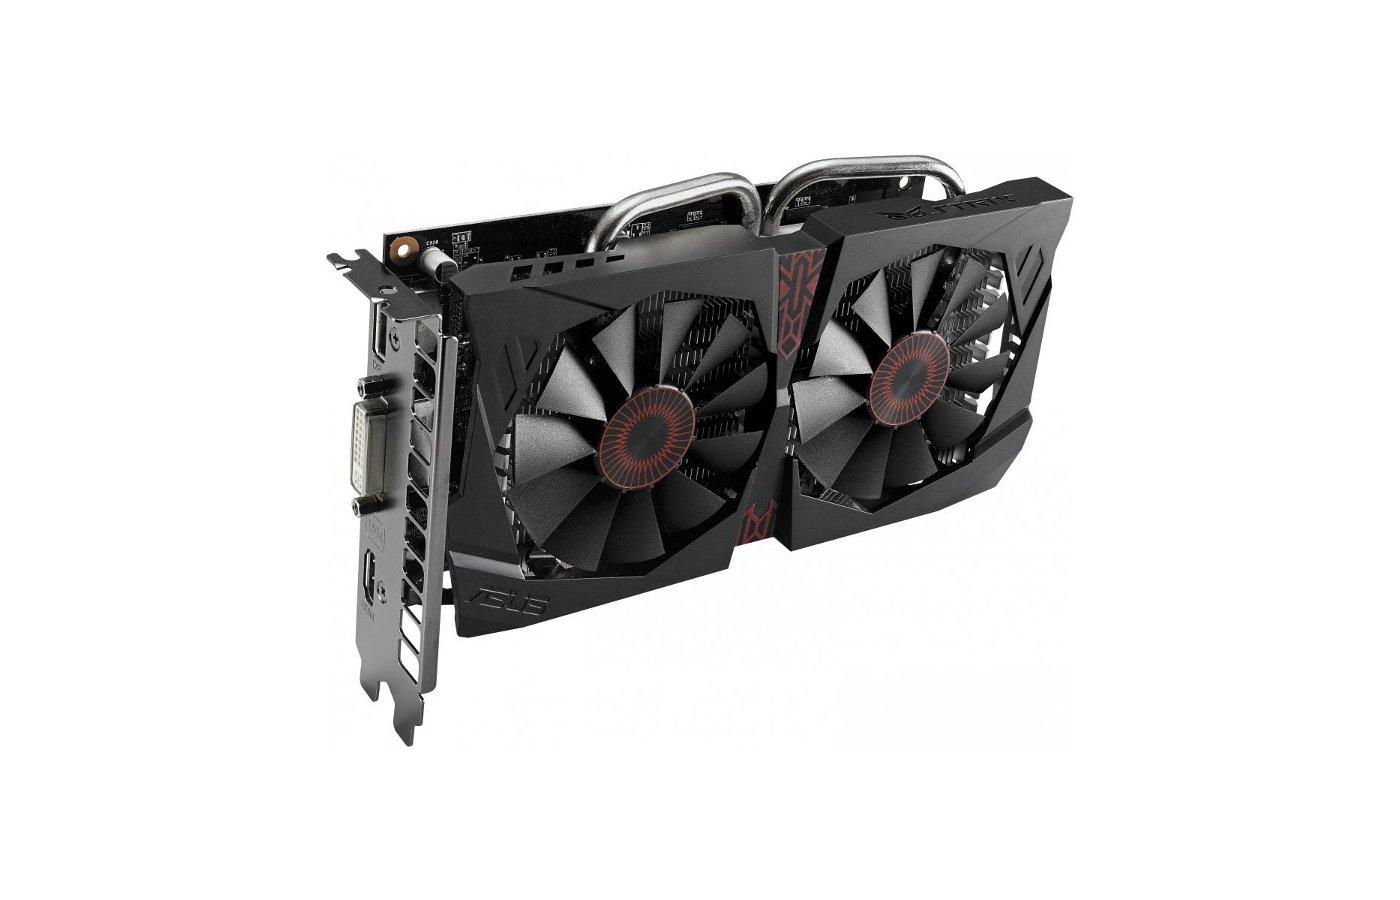 Видеокарта Asus PCI-E STRIX-GTX750TI-OC-2GD5 nVidia GeForce GTX 750Ti 2048Mb 128bit Ret